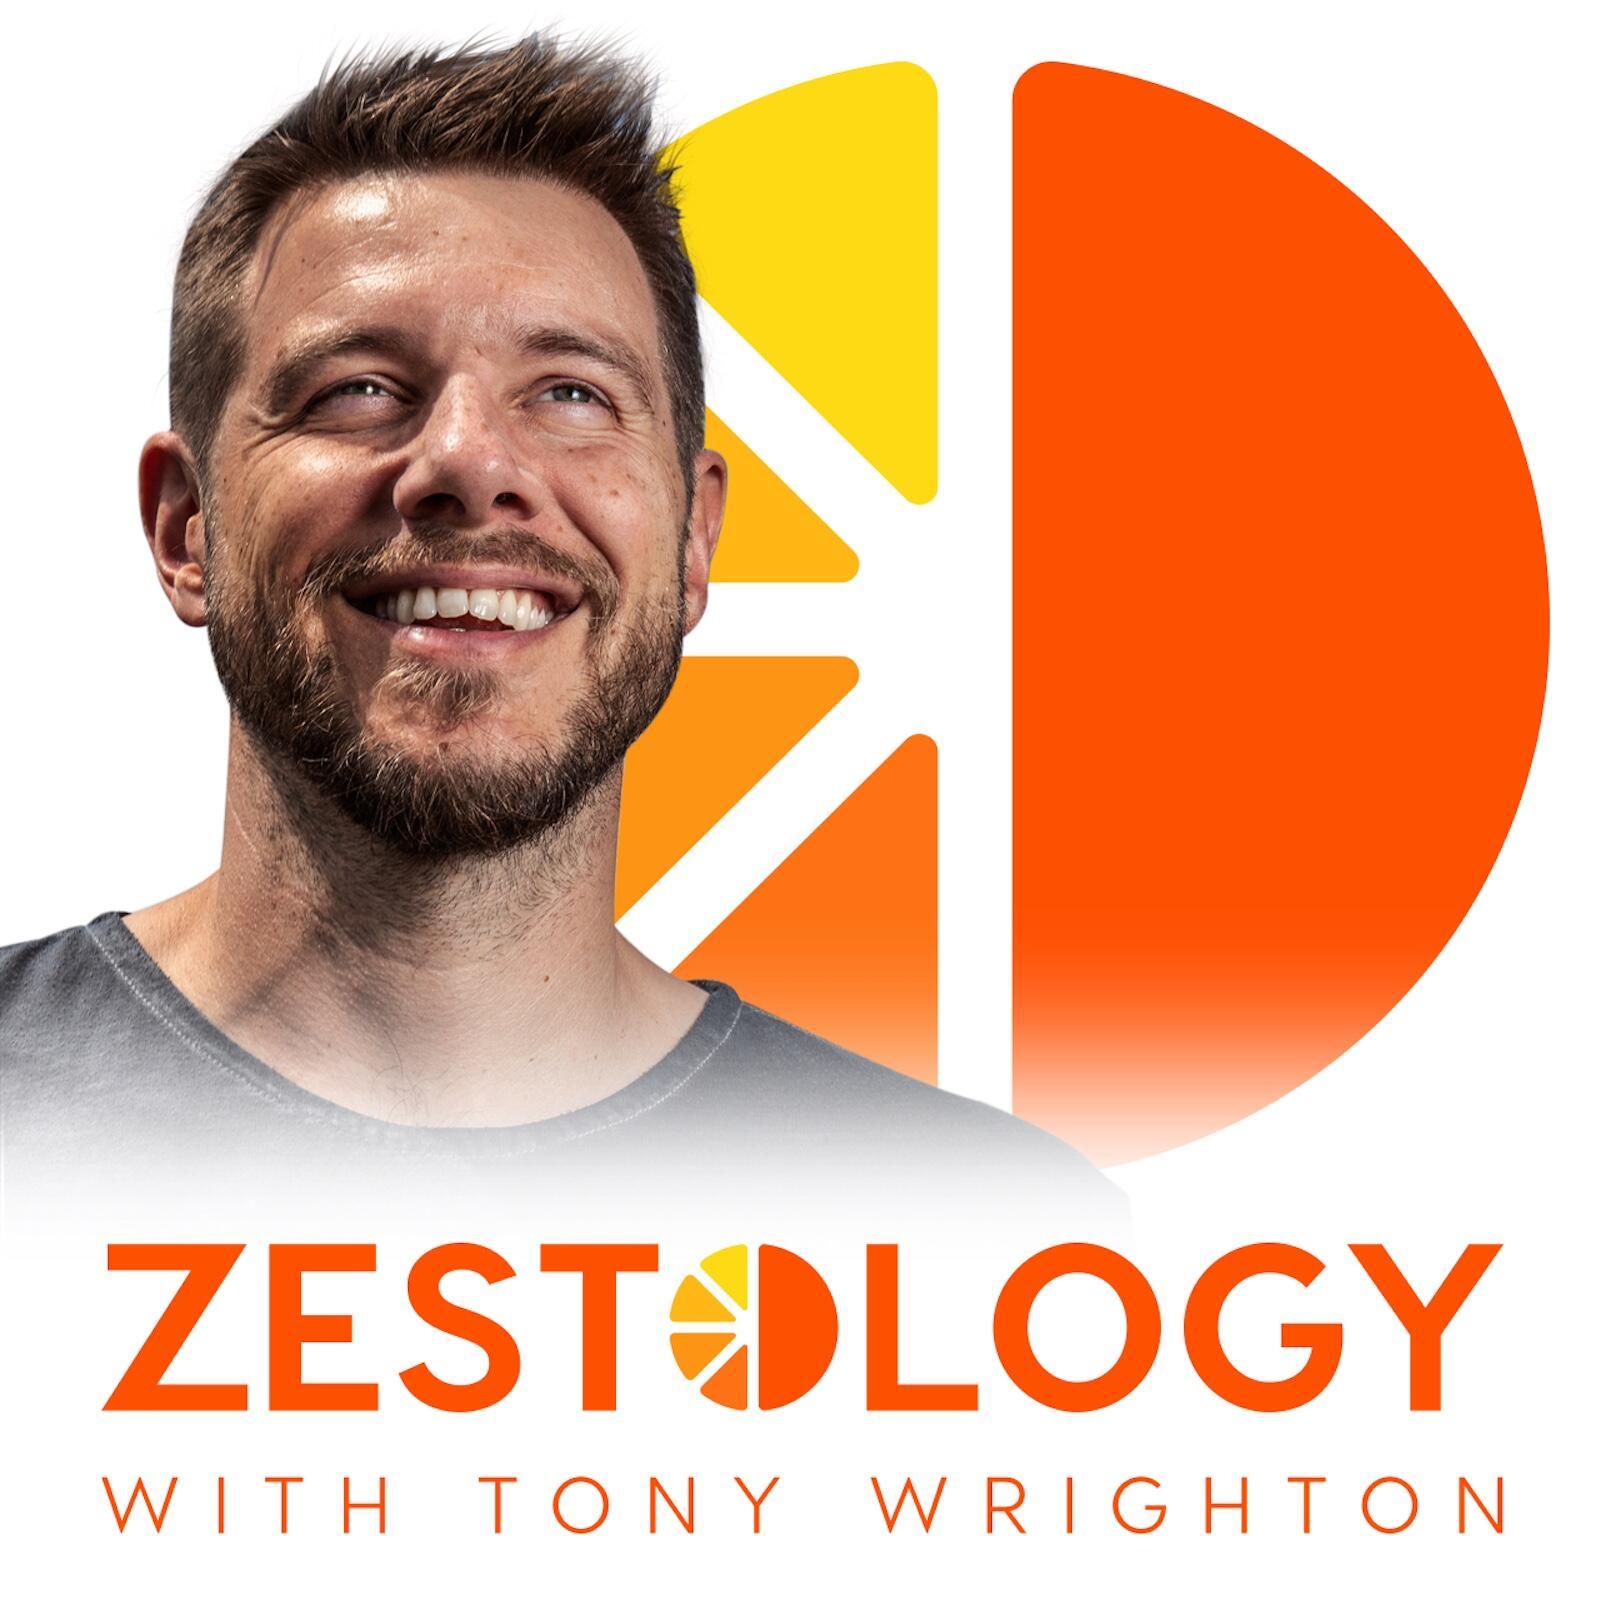 Zestology: Energy, vitality and motivation